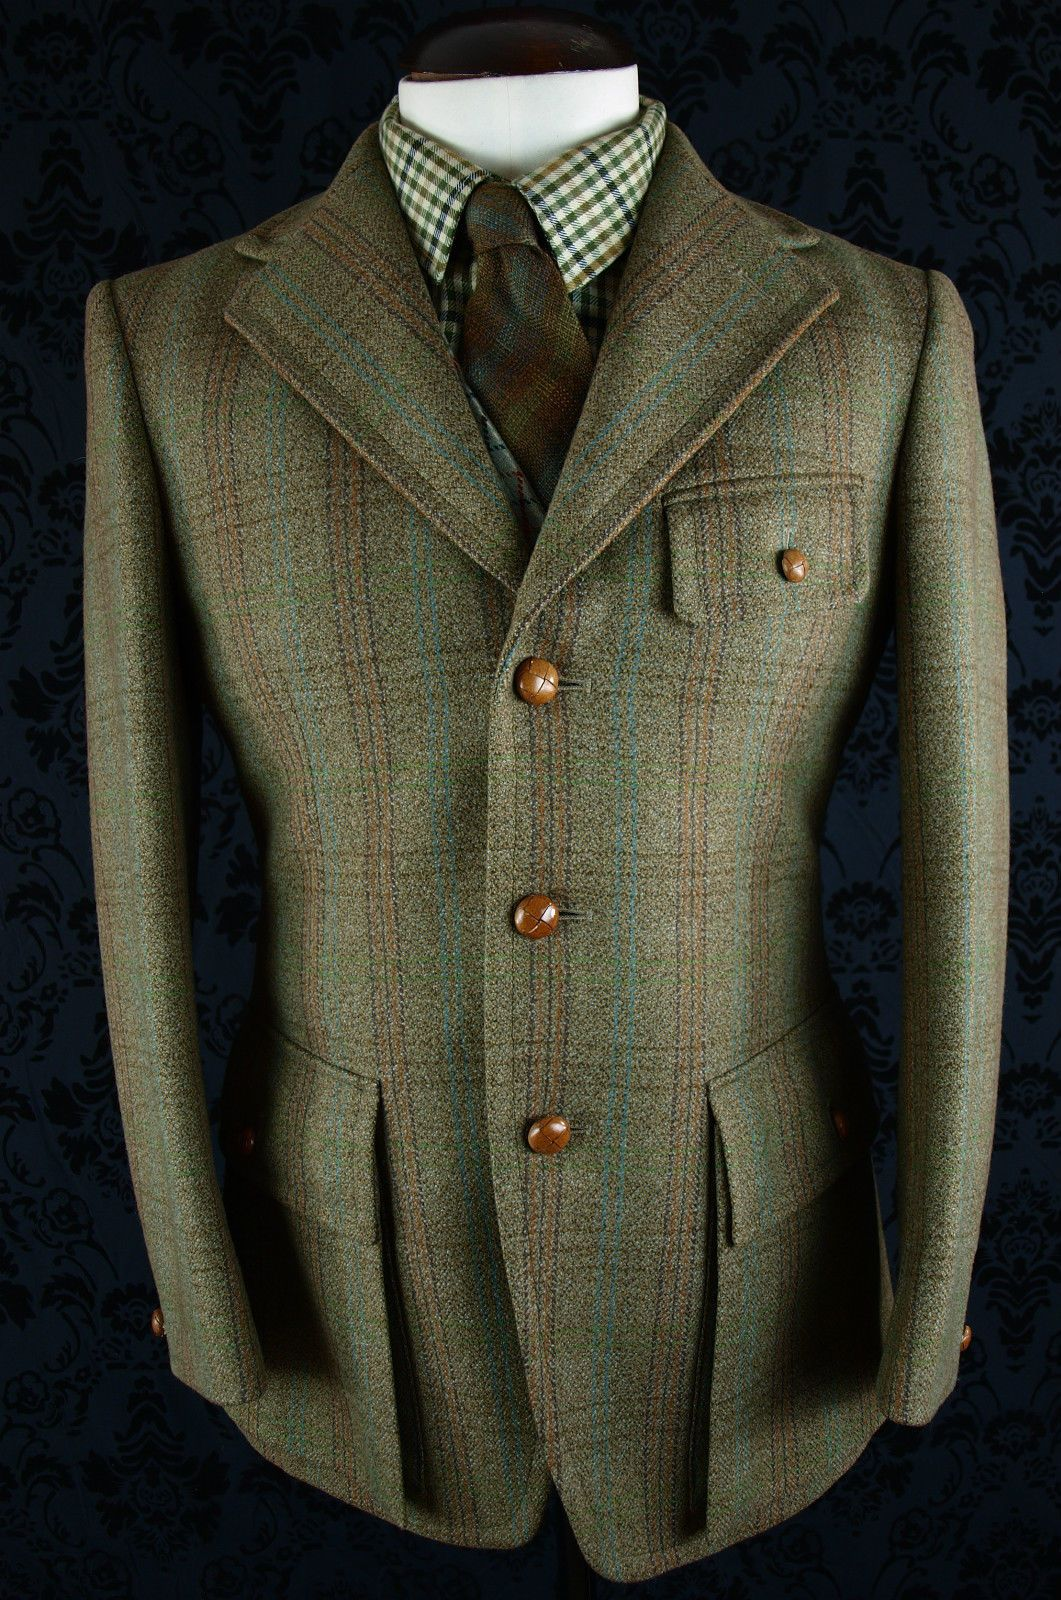 Superb Vtg Mens Bladen Tweed Norfolk Shooting Hunting Jacket Blazer 38 Small Jackets Men Fashion Norfolk Jacket Vintage Mens Fashion